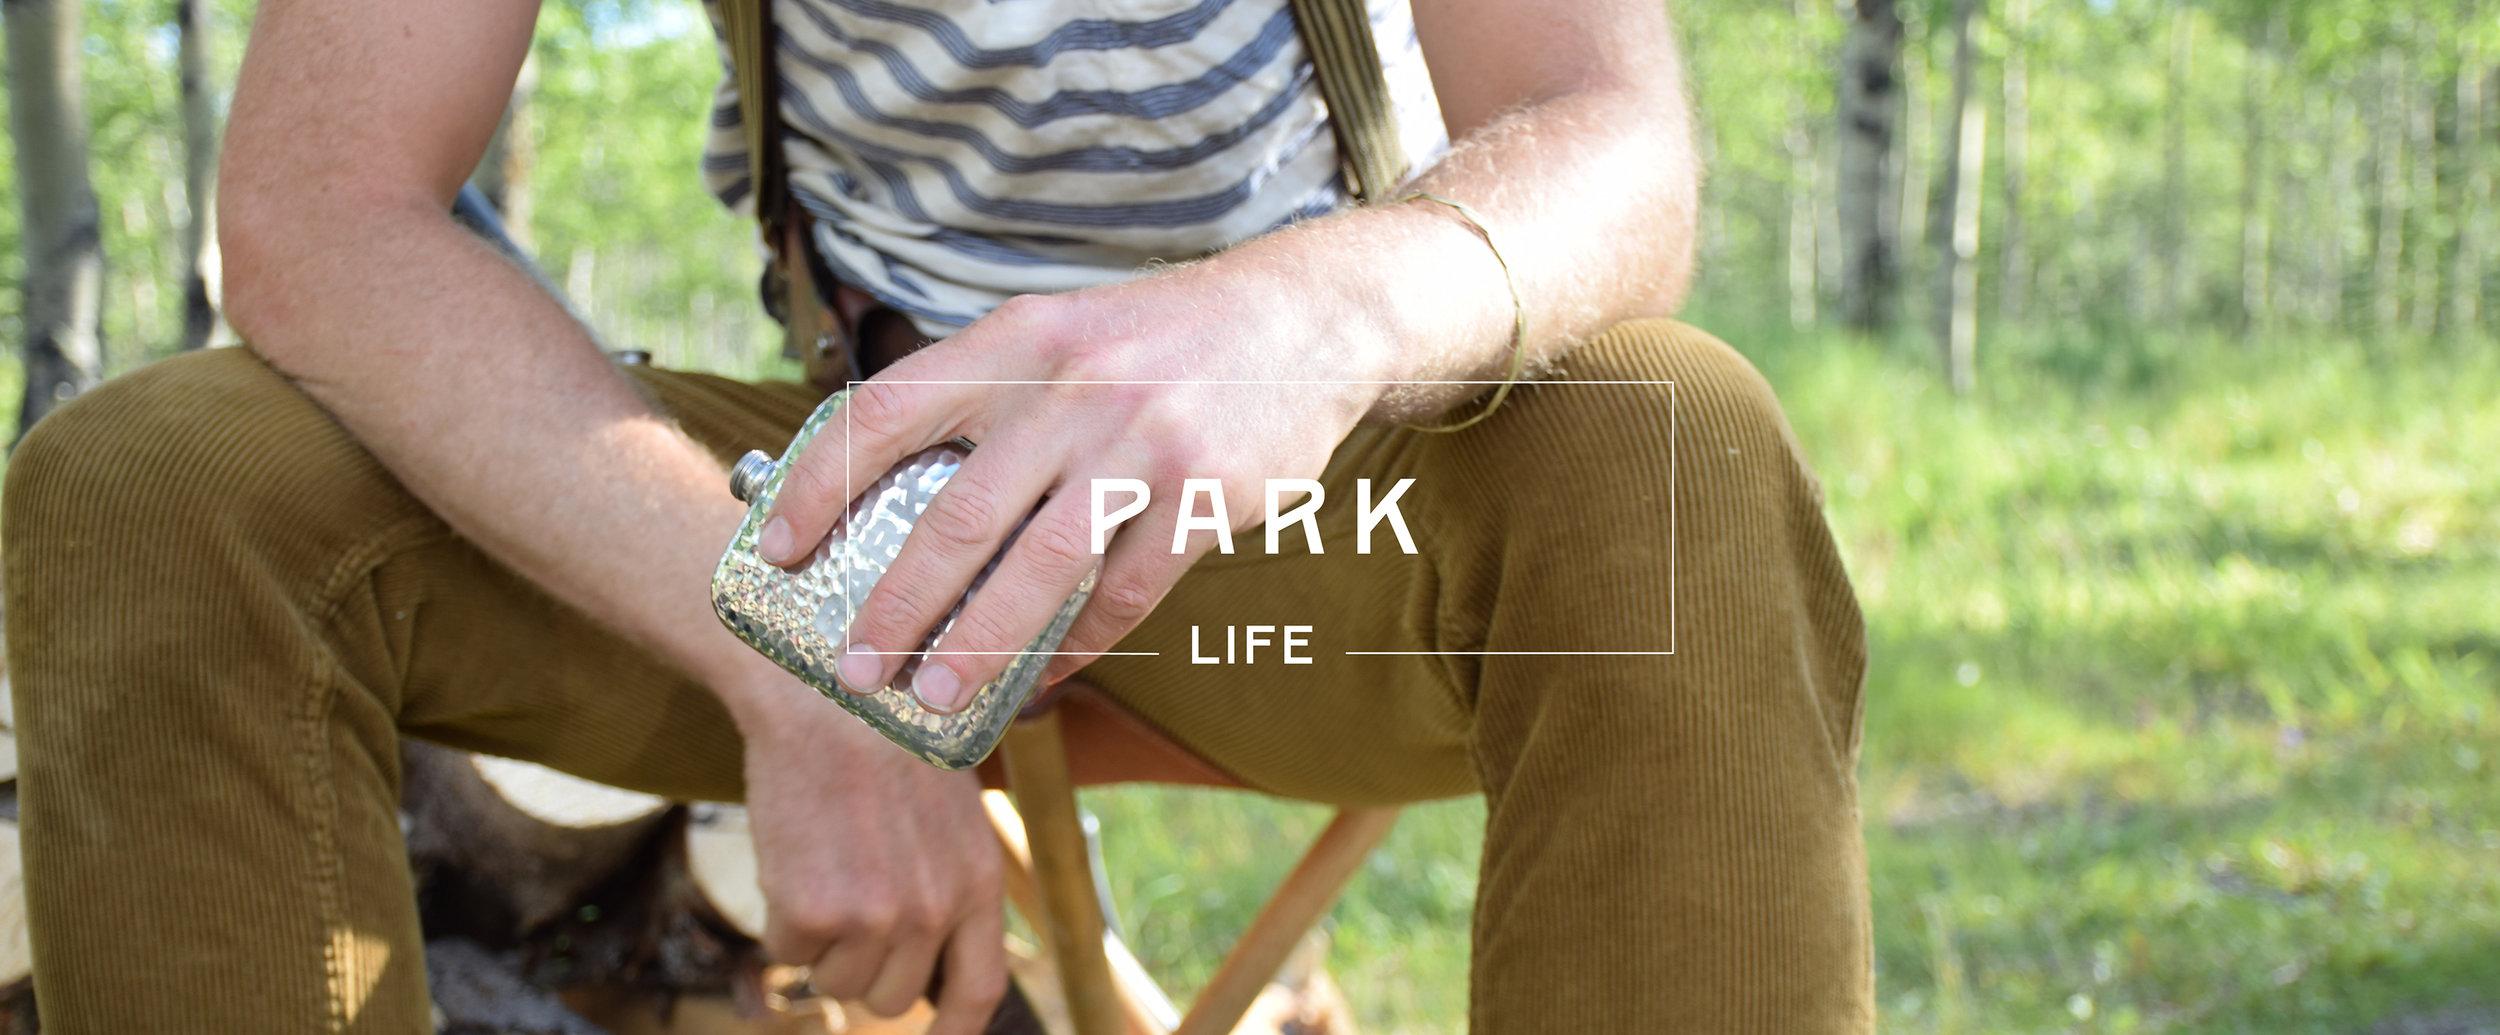 PARK LIFE Gallery Banner site.jpg